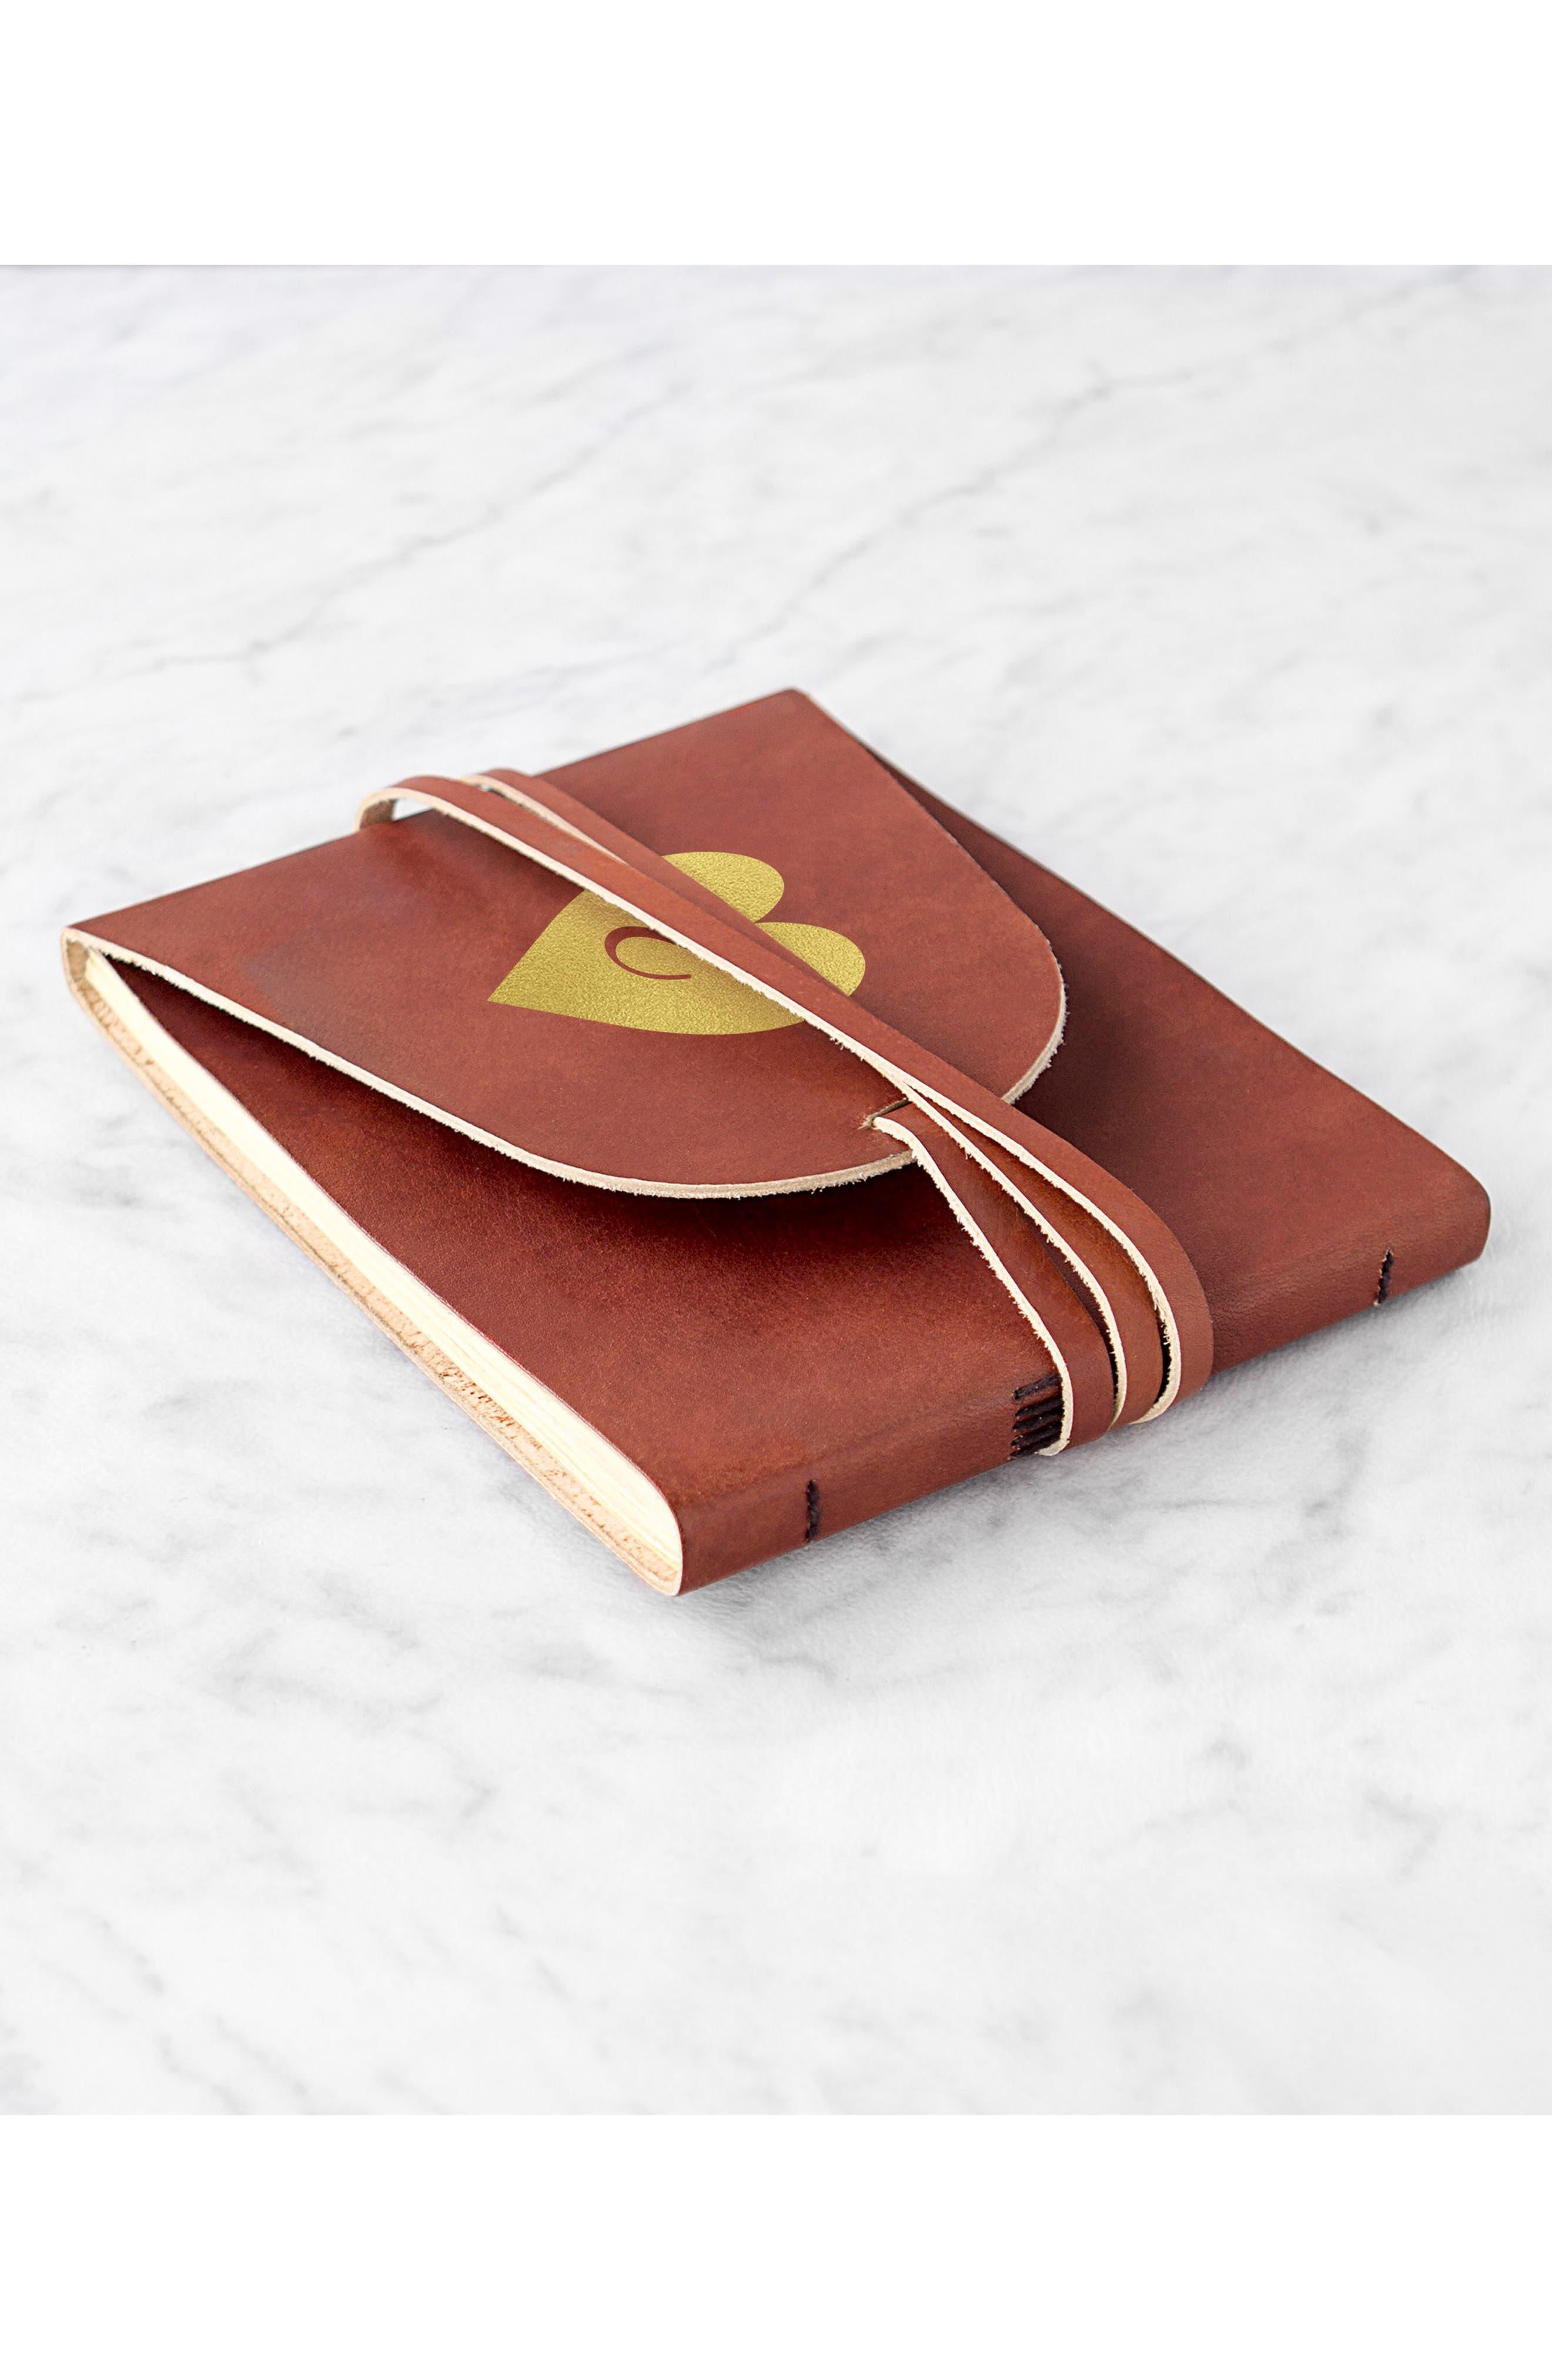 Monogram Leather Guest Book,                             Alternate thumbnail 9, color,                             710